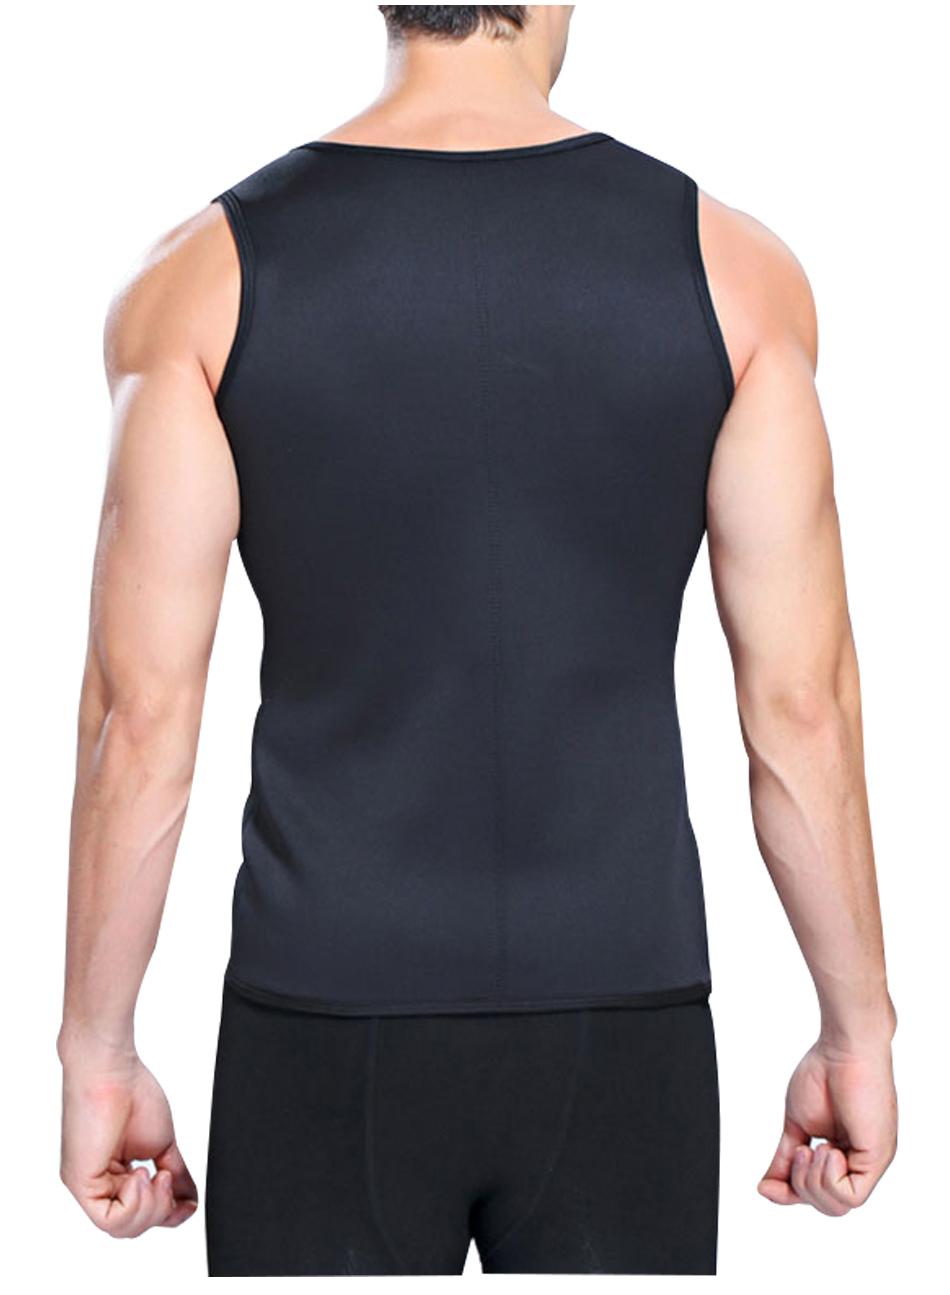 Hot Shapers Slimming T-shirt Neoprene Shaper Vest Men Slimming Body Shaper Corset Waist Trainer Belt Super Stretch Shapewear 6